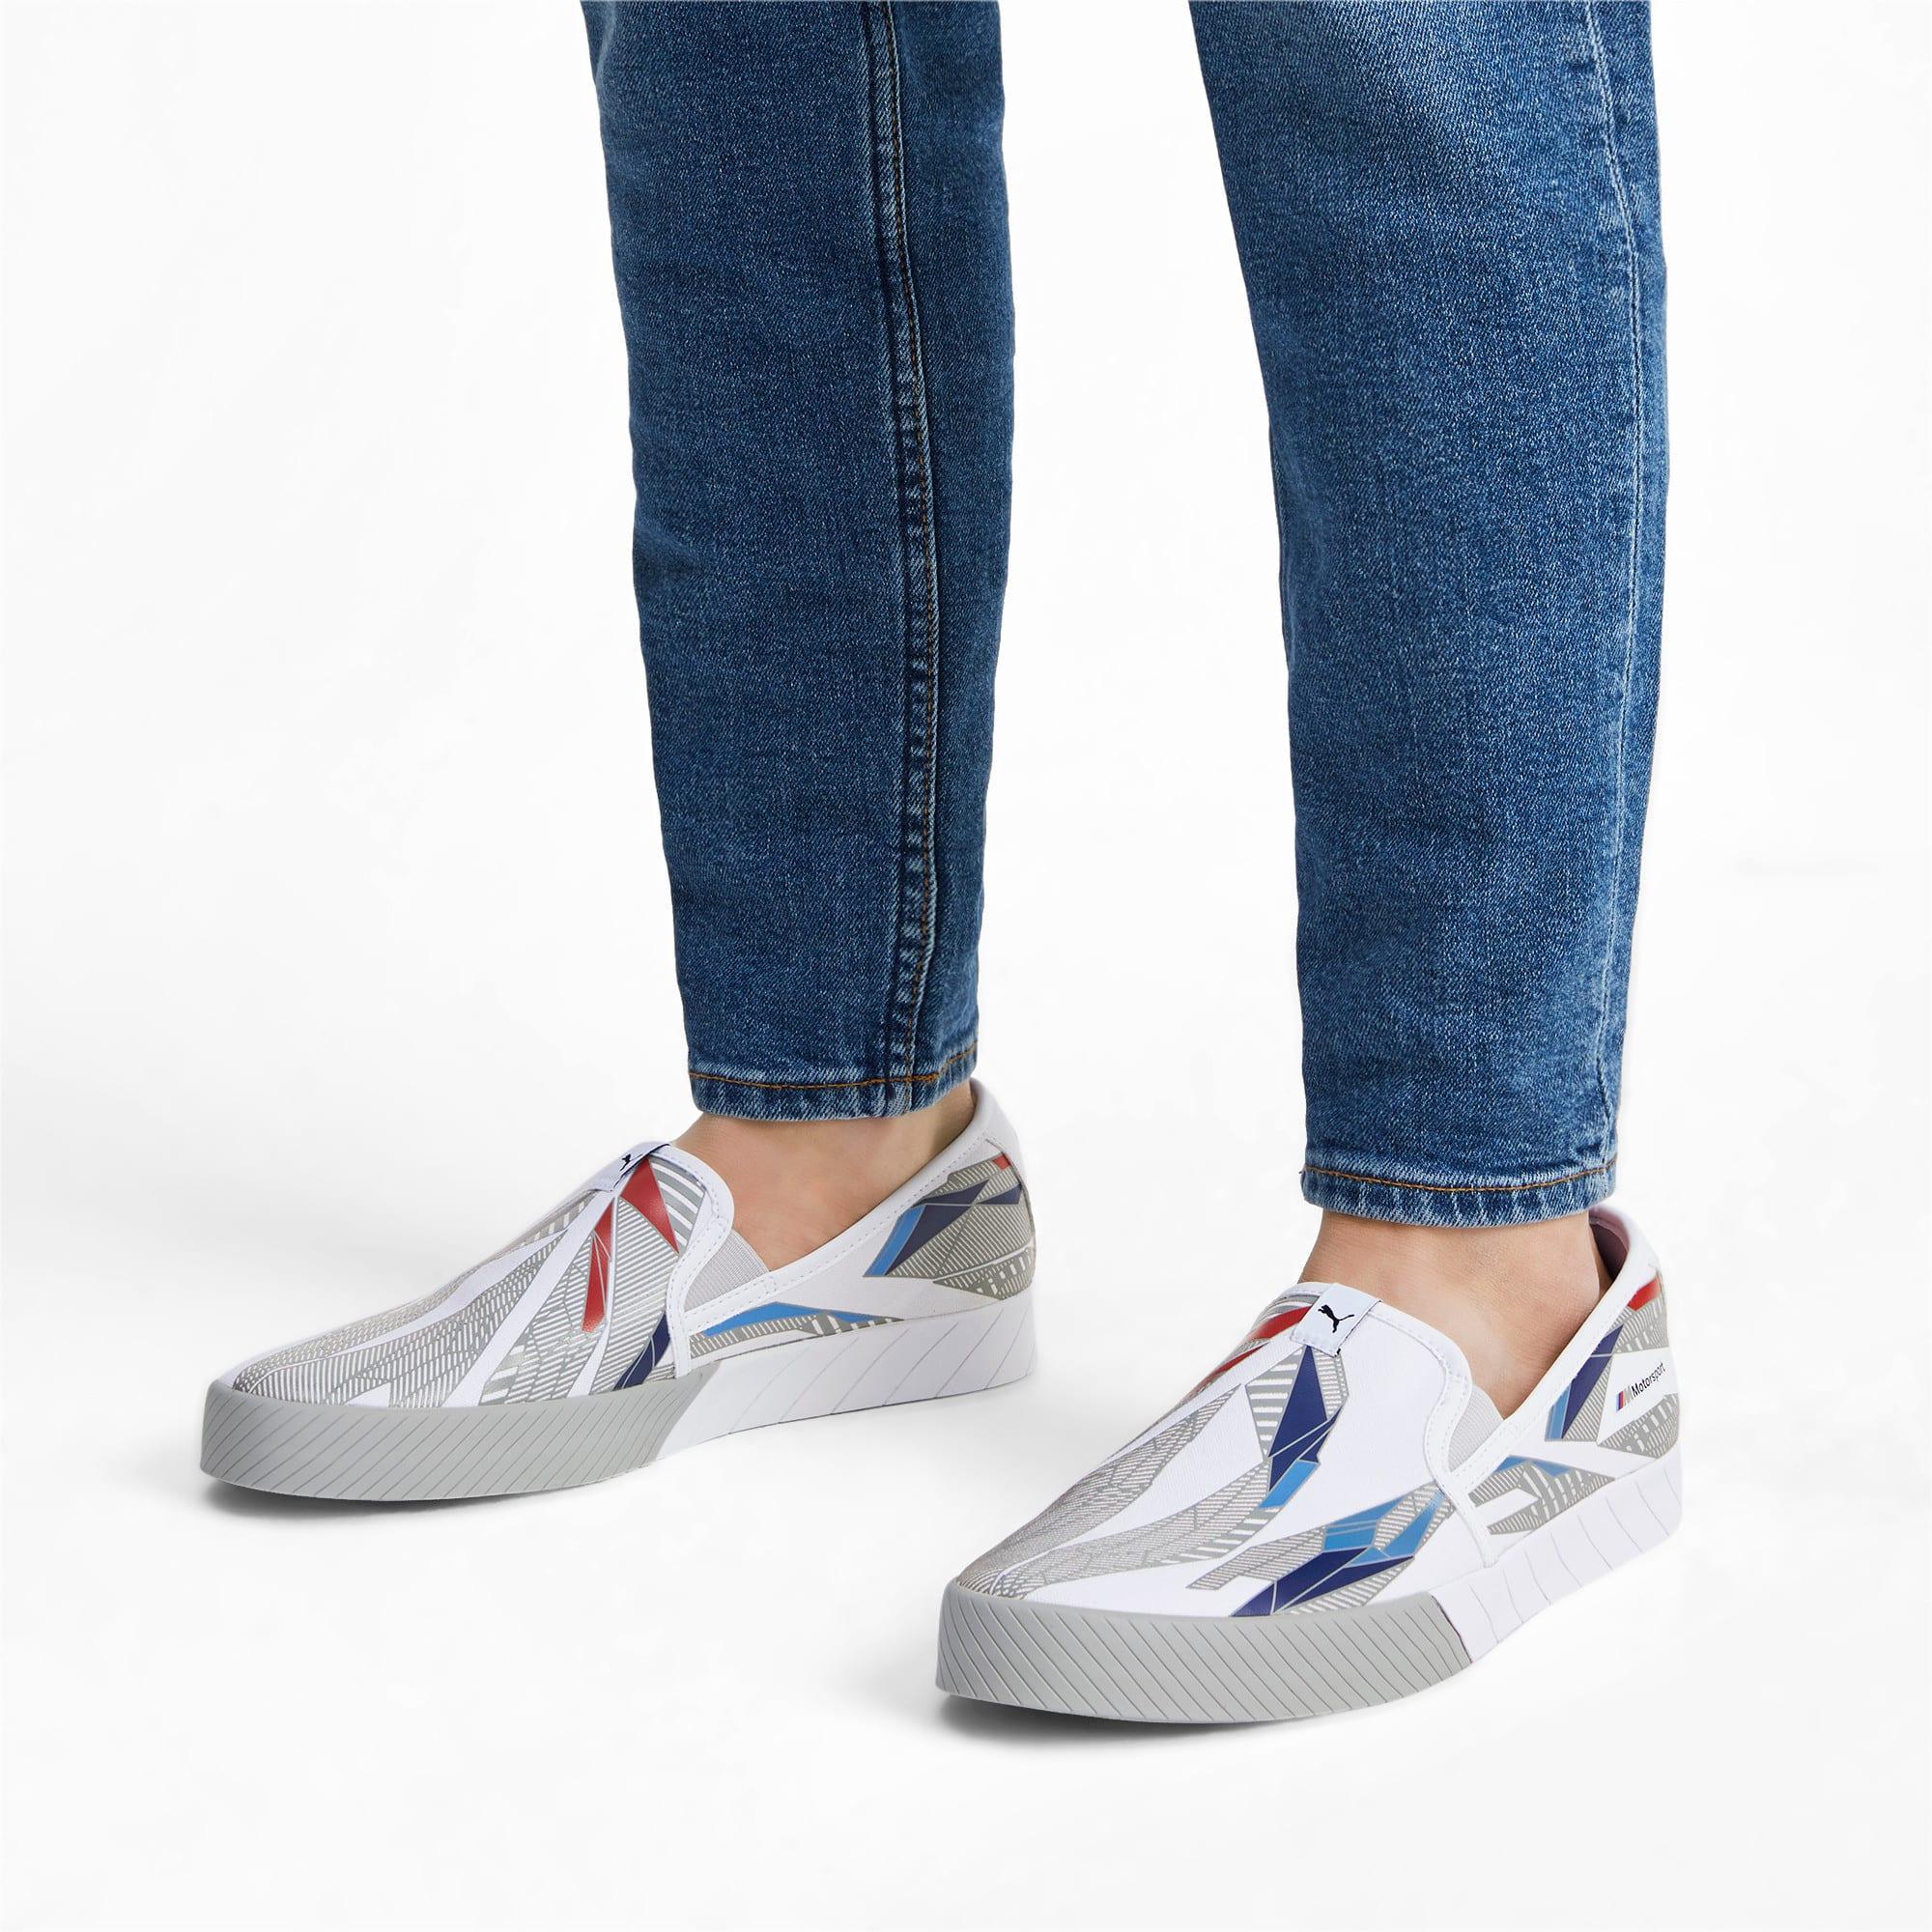 Thumbnail 2 of BMW M Slip-On Track Shoes, Puma White-Gray Violet, medium-IND